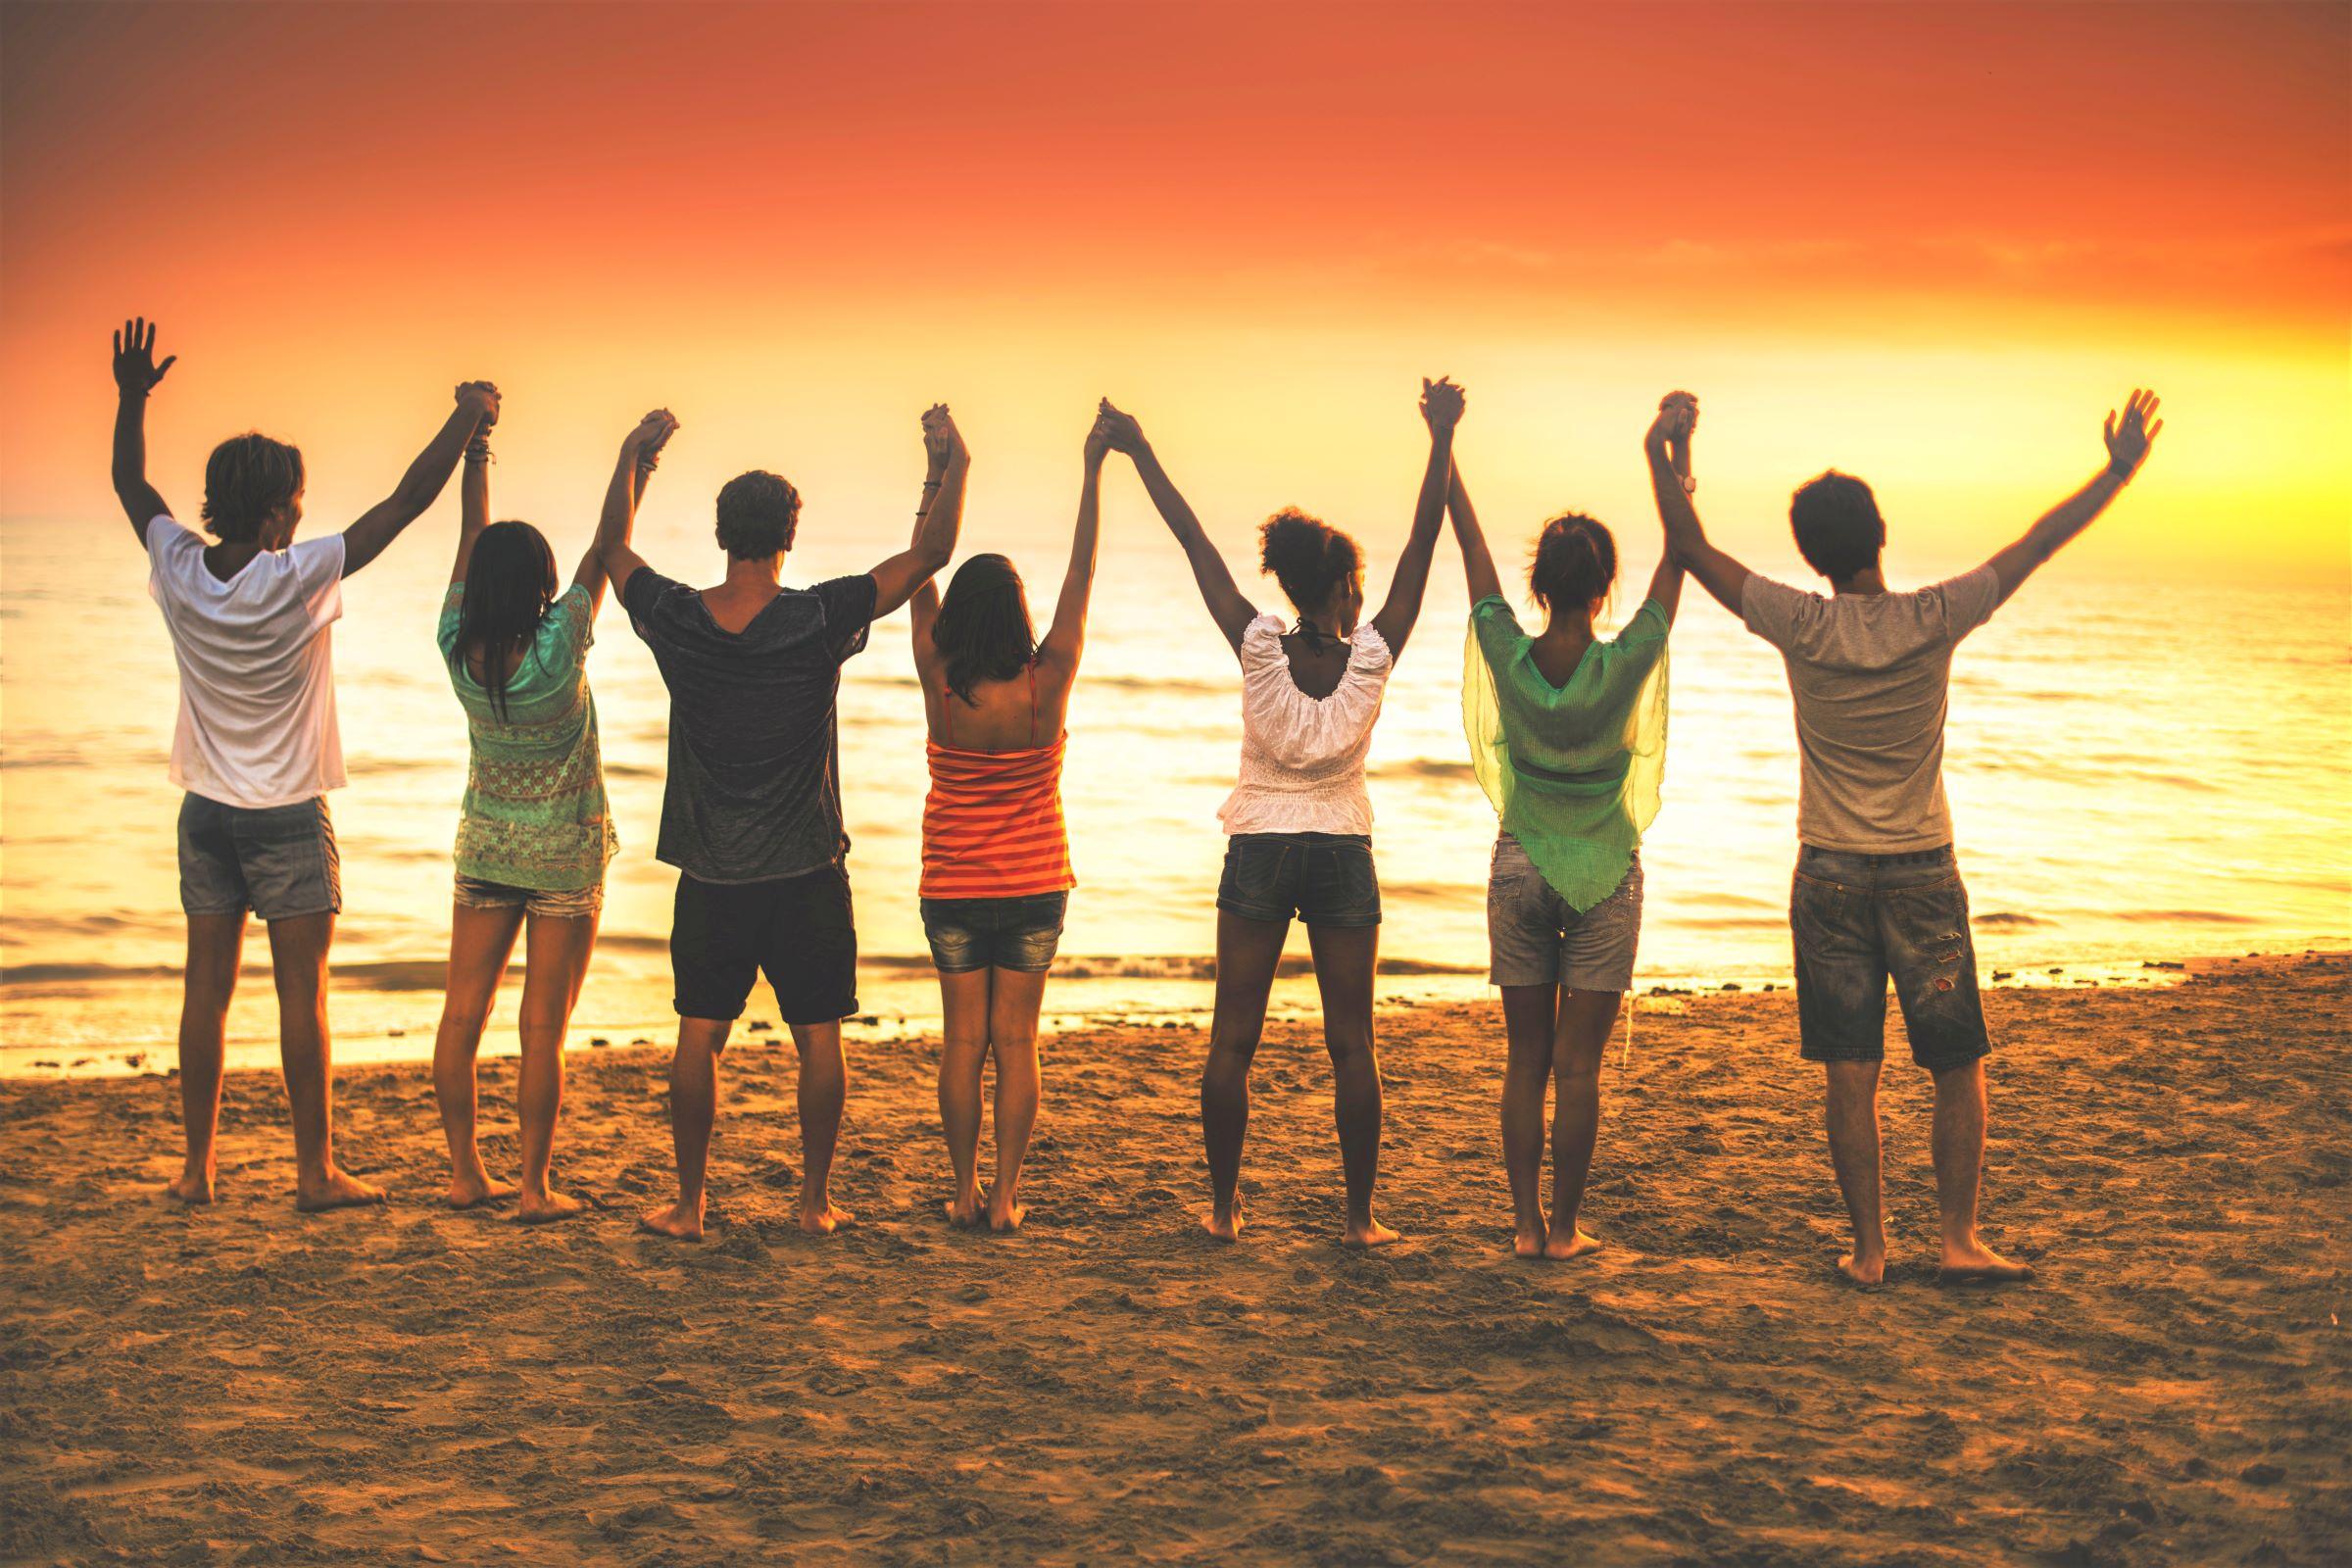 Beach_Retreat_Handraise_Canalside_Inn